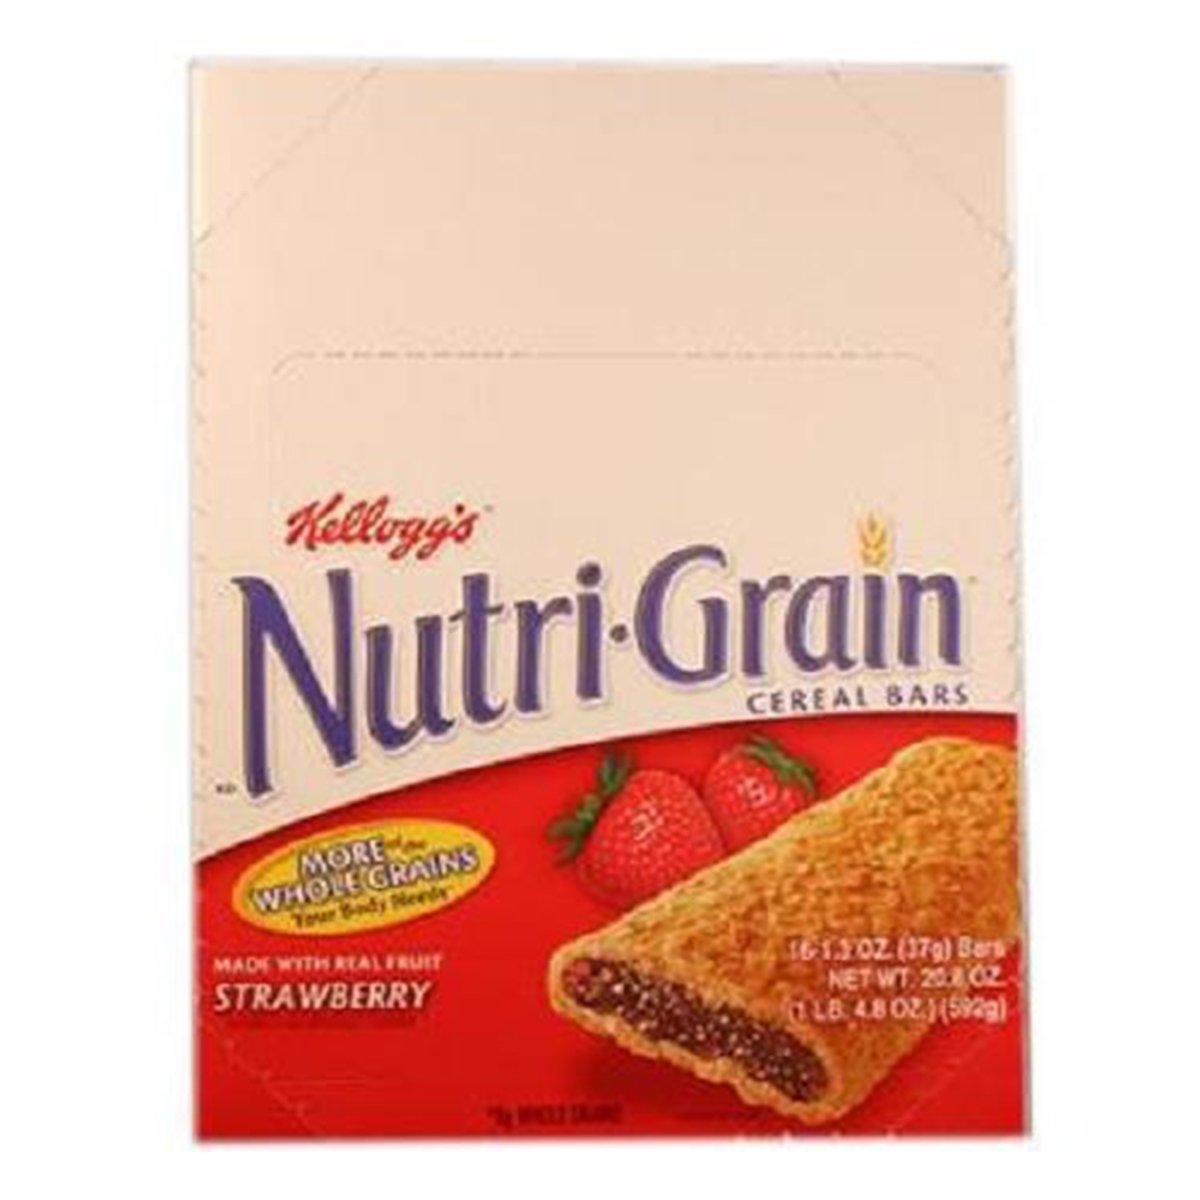 Product Of Kelloggs Nutri-Grain, Cereal Bar Strawberry, Count 16 (1.3 oz) - Granola/Cereal/Oat/Brkfast Bar / Grab Varieties & Flavors